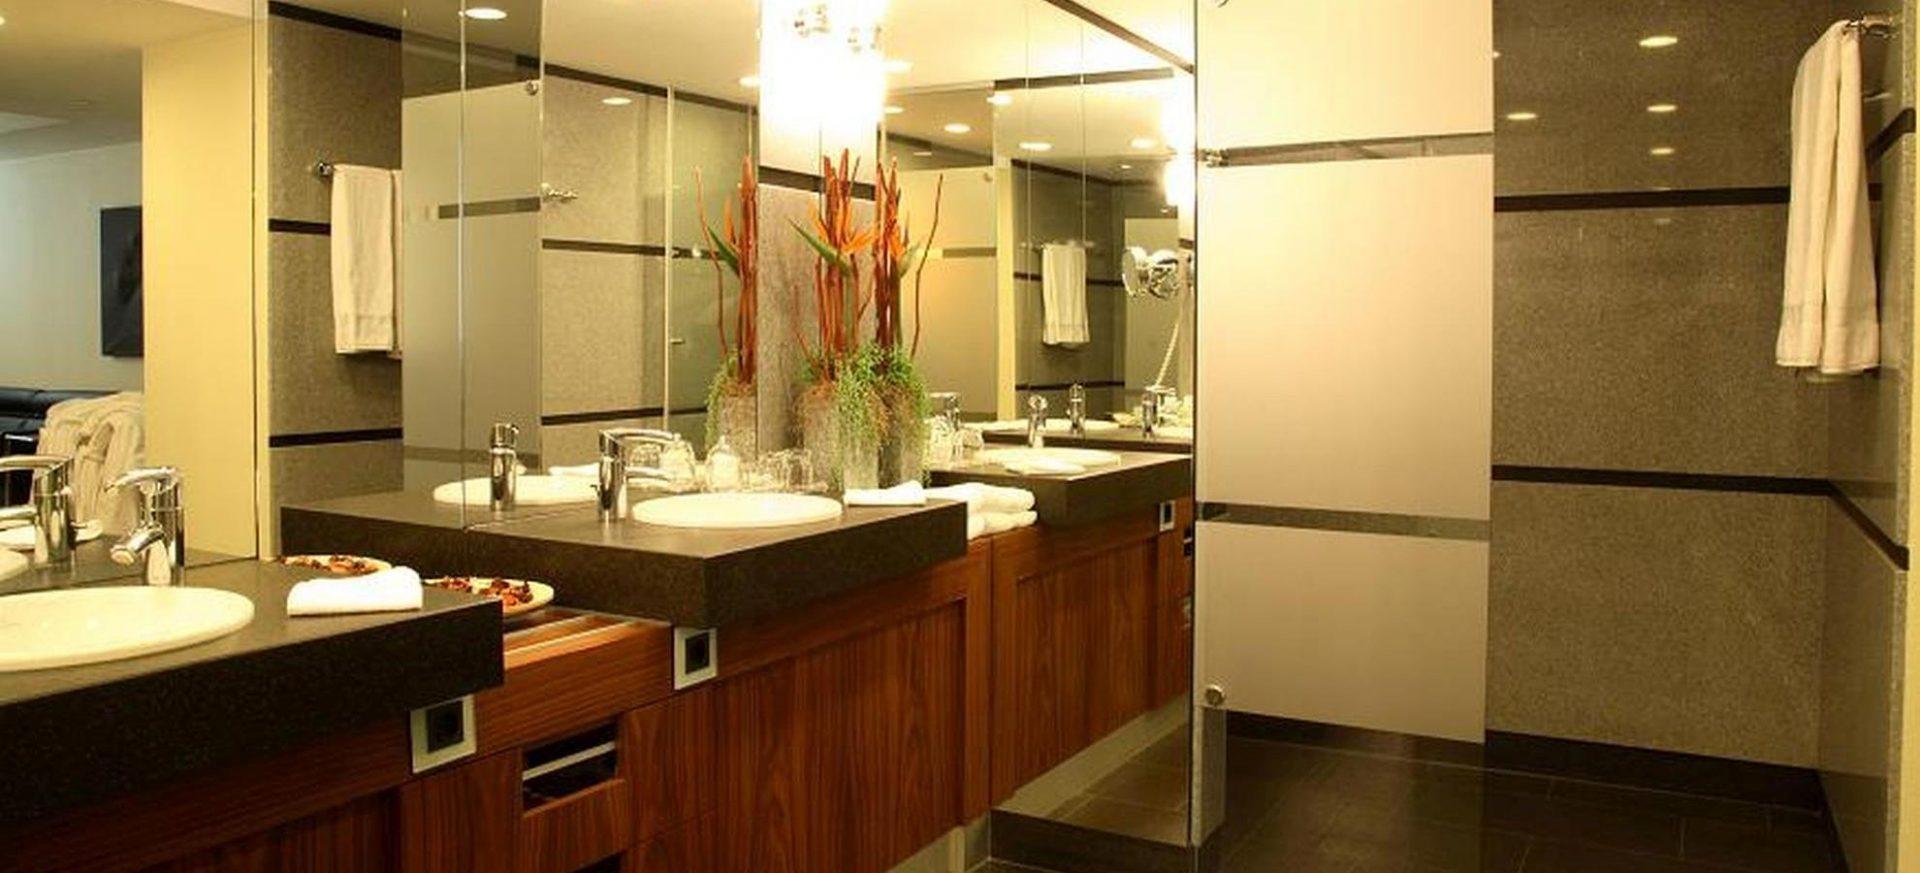 Radisson Blu Hotel Erfurt Executive Suite Badezimmer / Bathroom